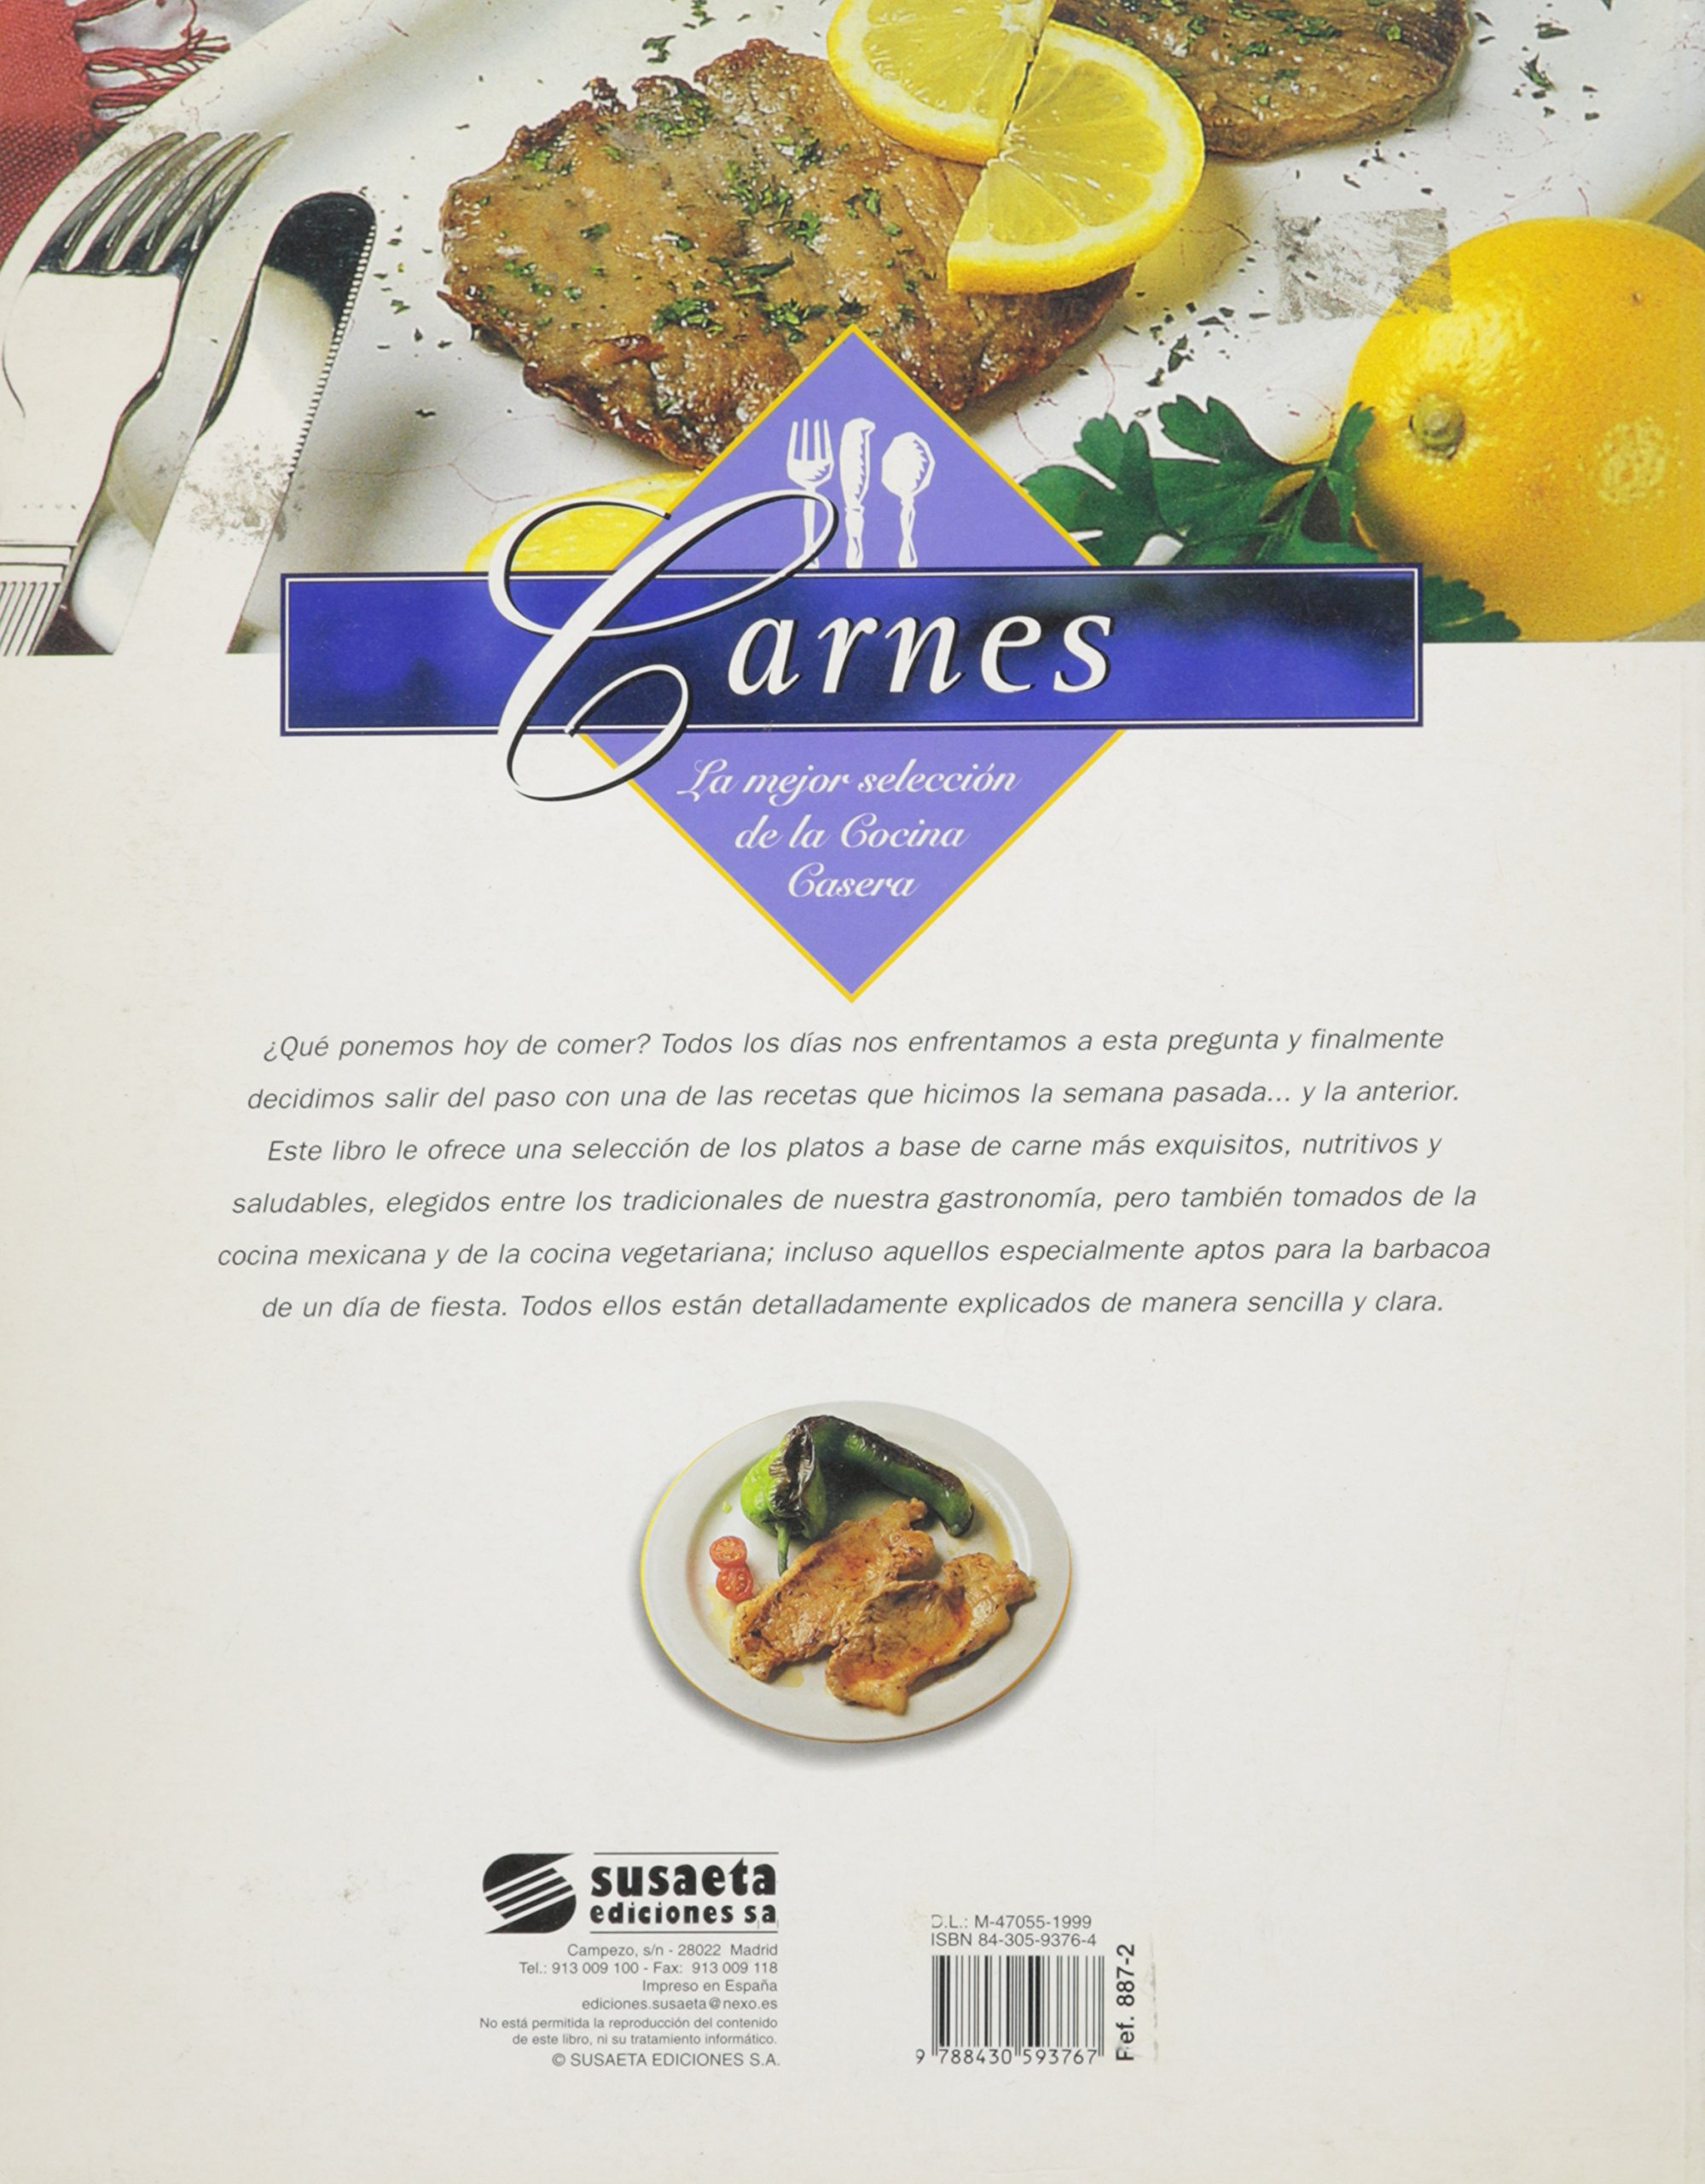 Carnes - La Mejor Seleccion de La Cocina Casera (Spanish Edition): Susaeta: 9788430593767: Amazon.com: Books